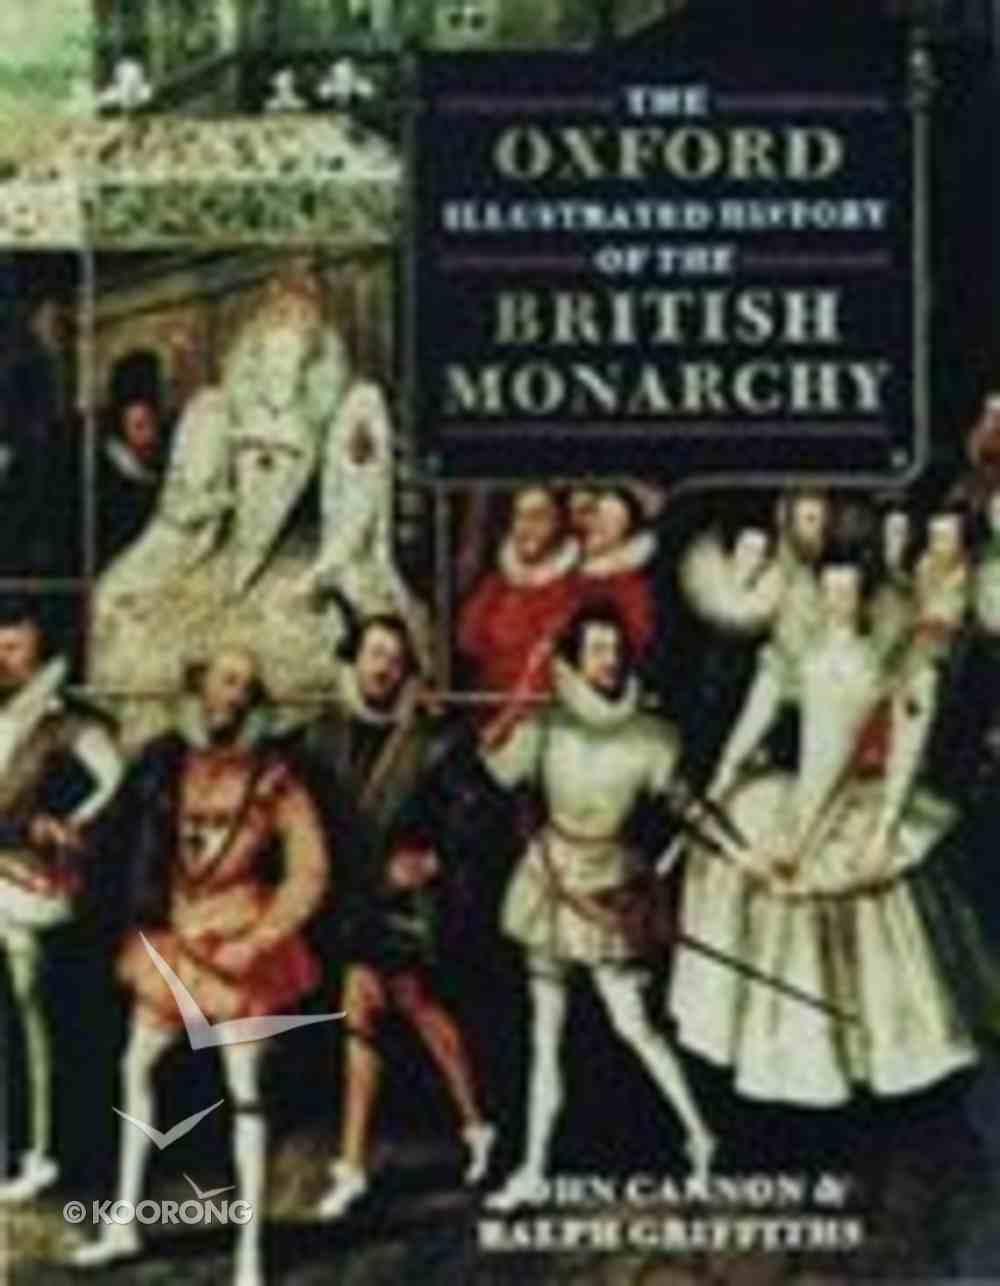 Oxford Illustrated History of the British Monarchy Hardback